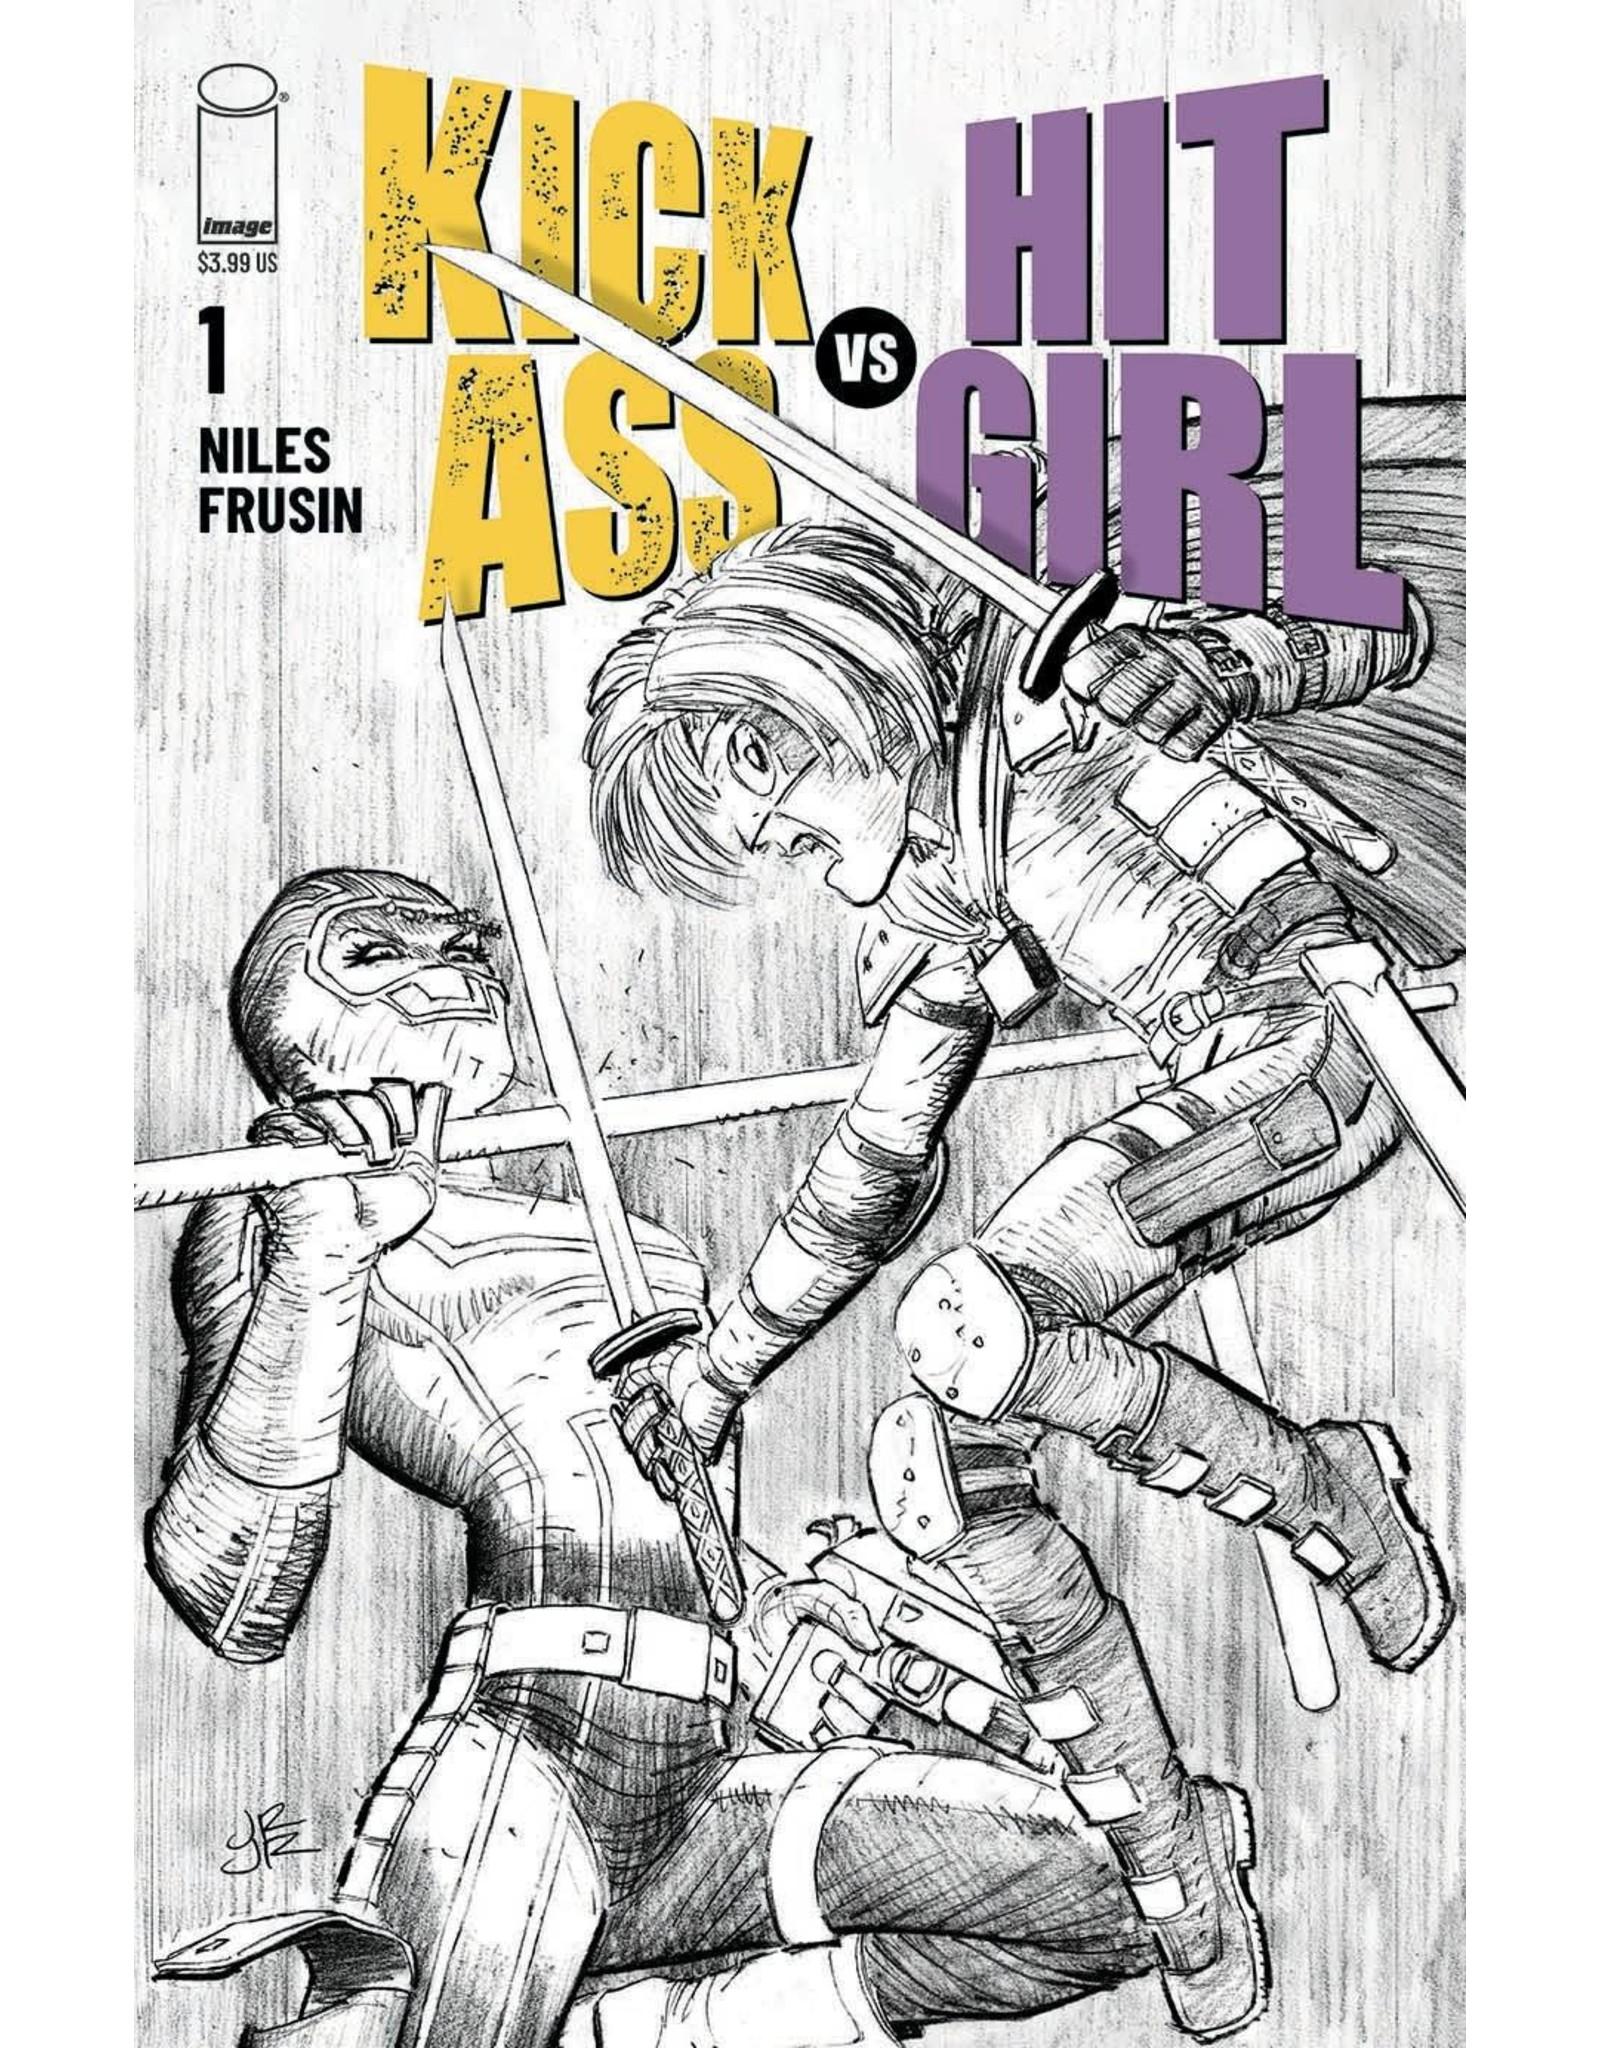 Image Comics KICK-ASS VS HIT-GIRL #1 (OF 5) CVR B ROMITA JR (RES) (MR)